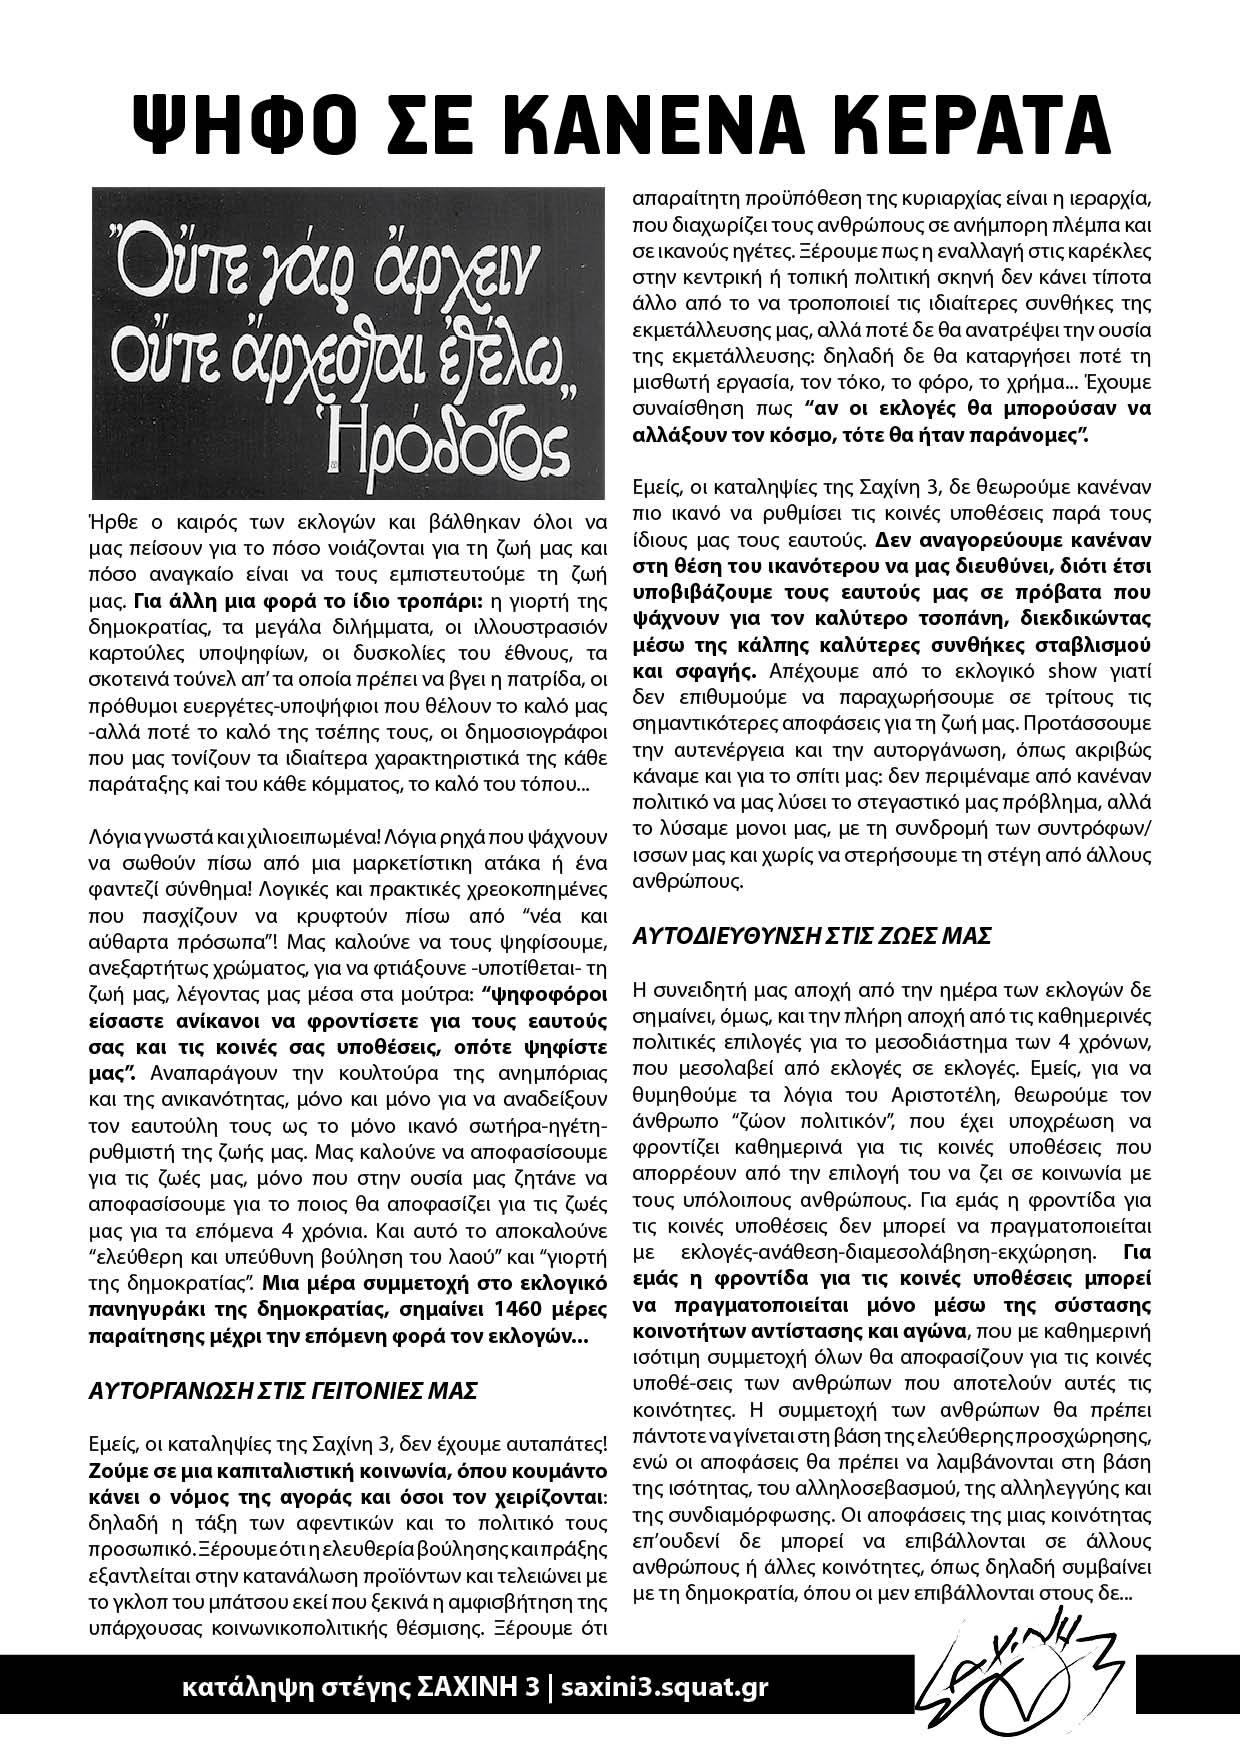 keimeno_10_-_antiekloges_-_13-05-2015_-_web[1]